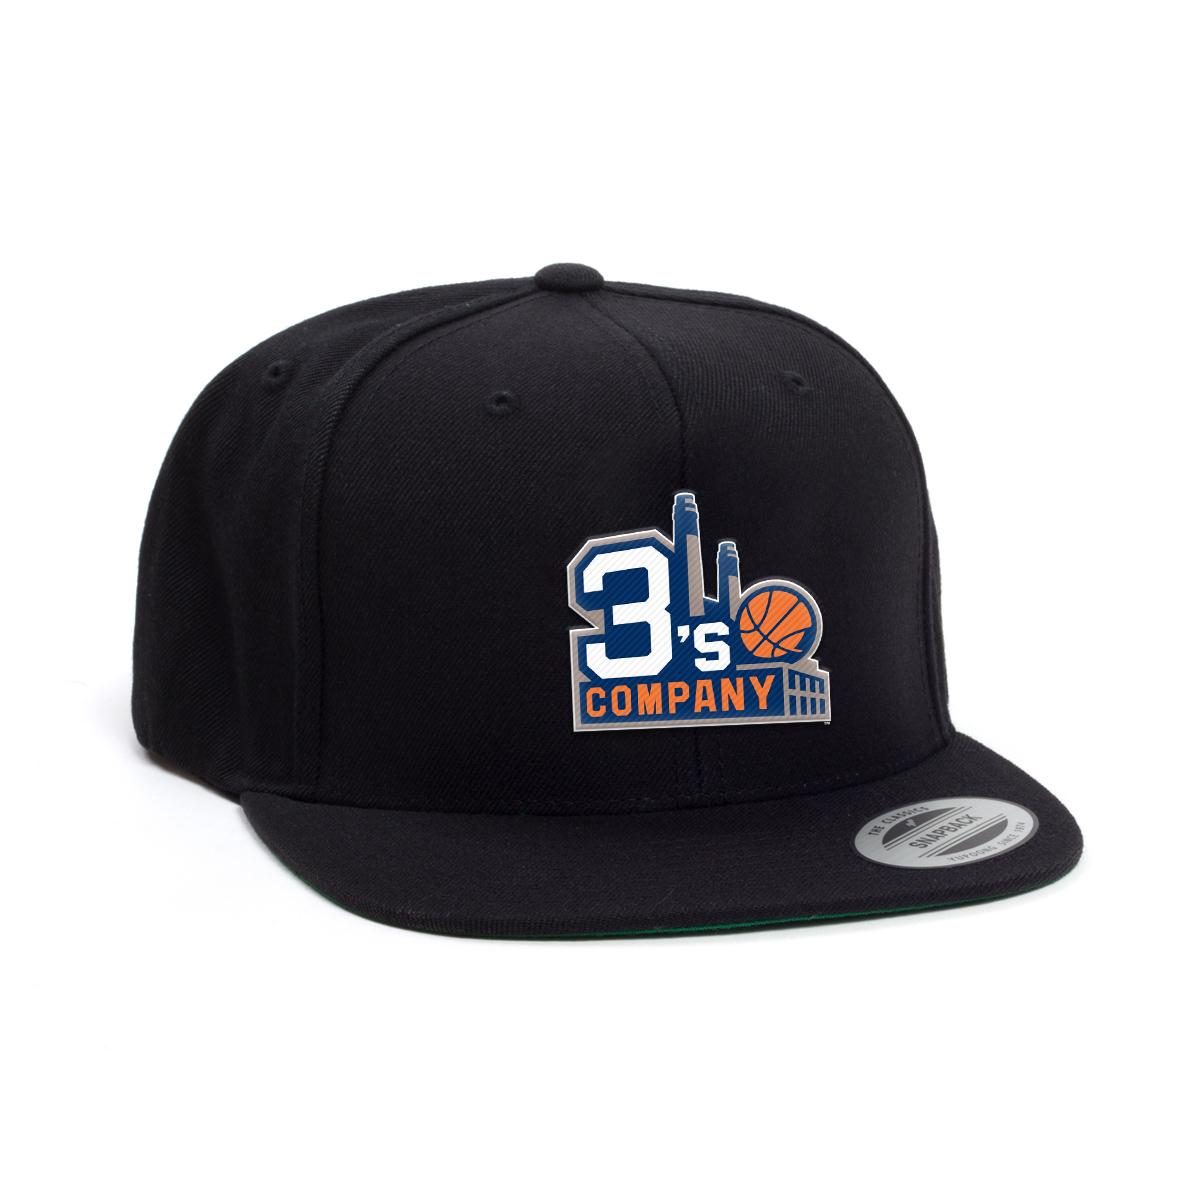 BIG3 3'S COMPANY FLEX HAT